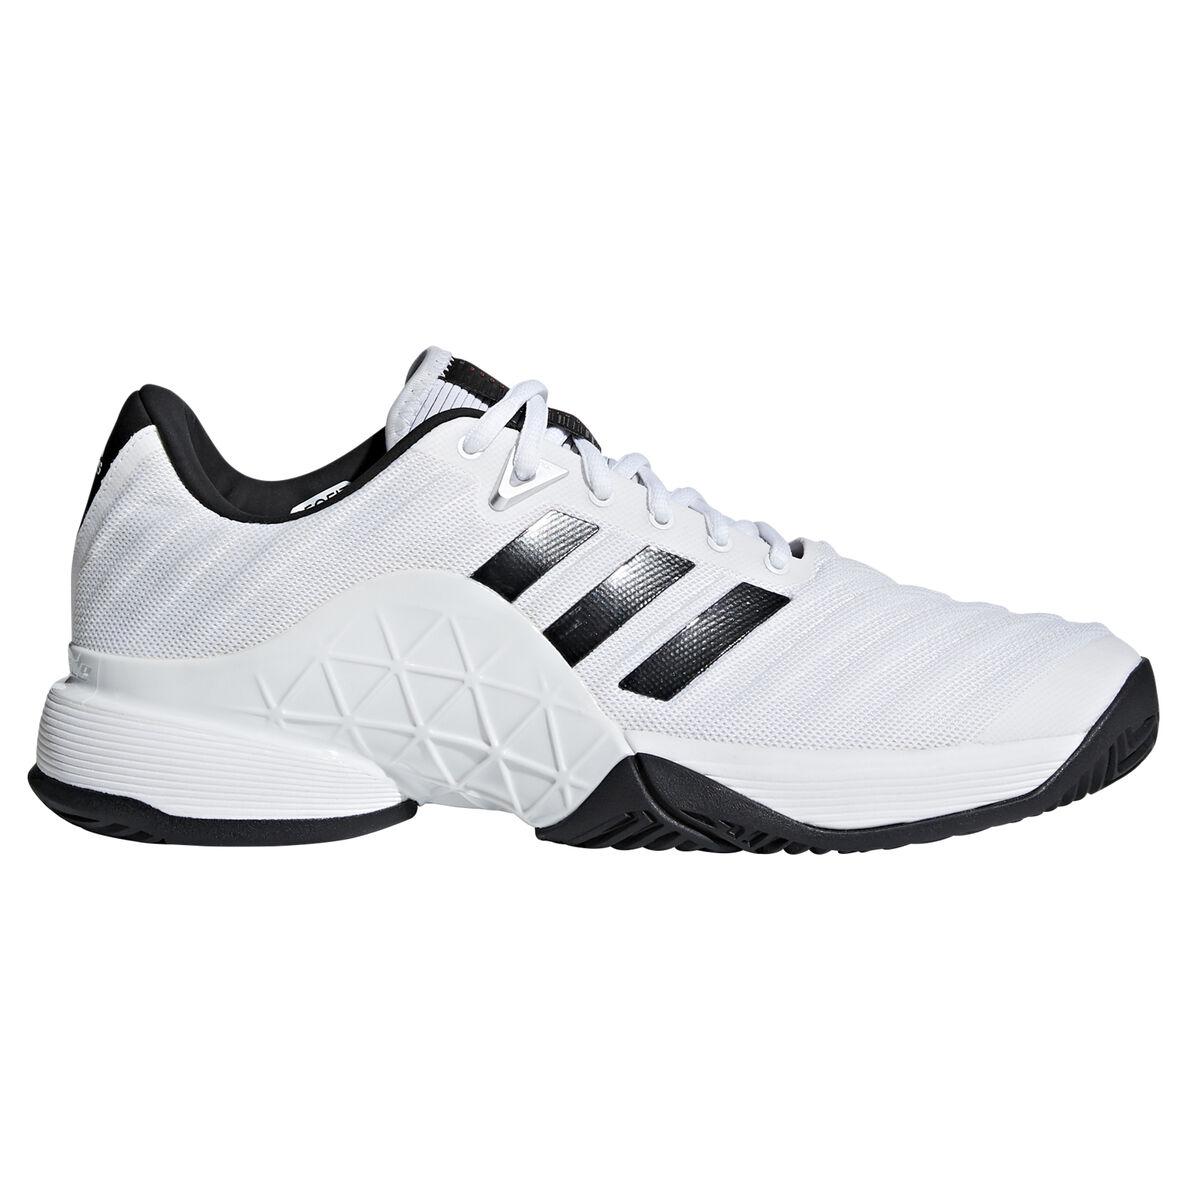 36efd155771 adidas Barricade 2018 Men's Tennis Shoes - White/Black Zoom Image